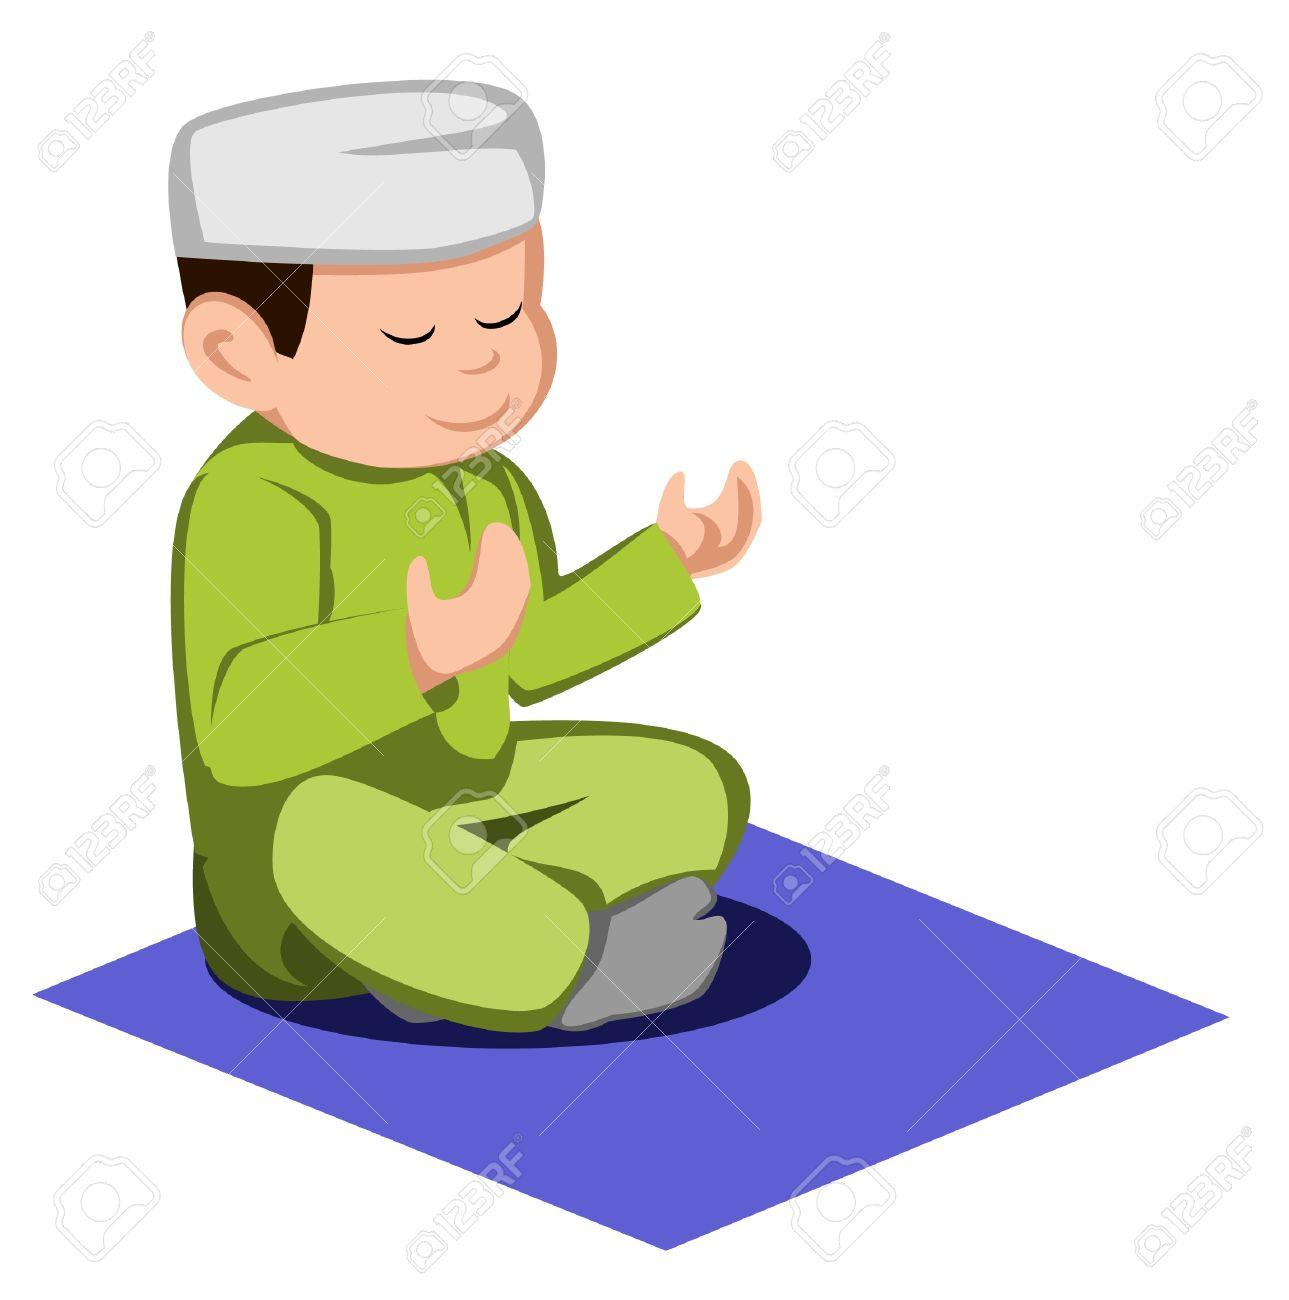 1289x1300 Muslim Praying Clipart